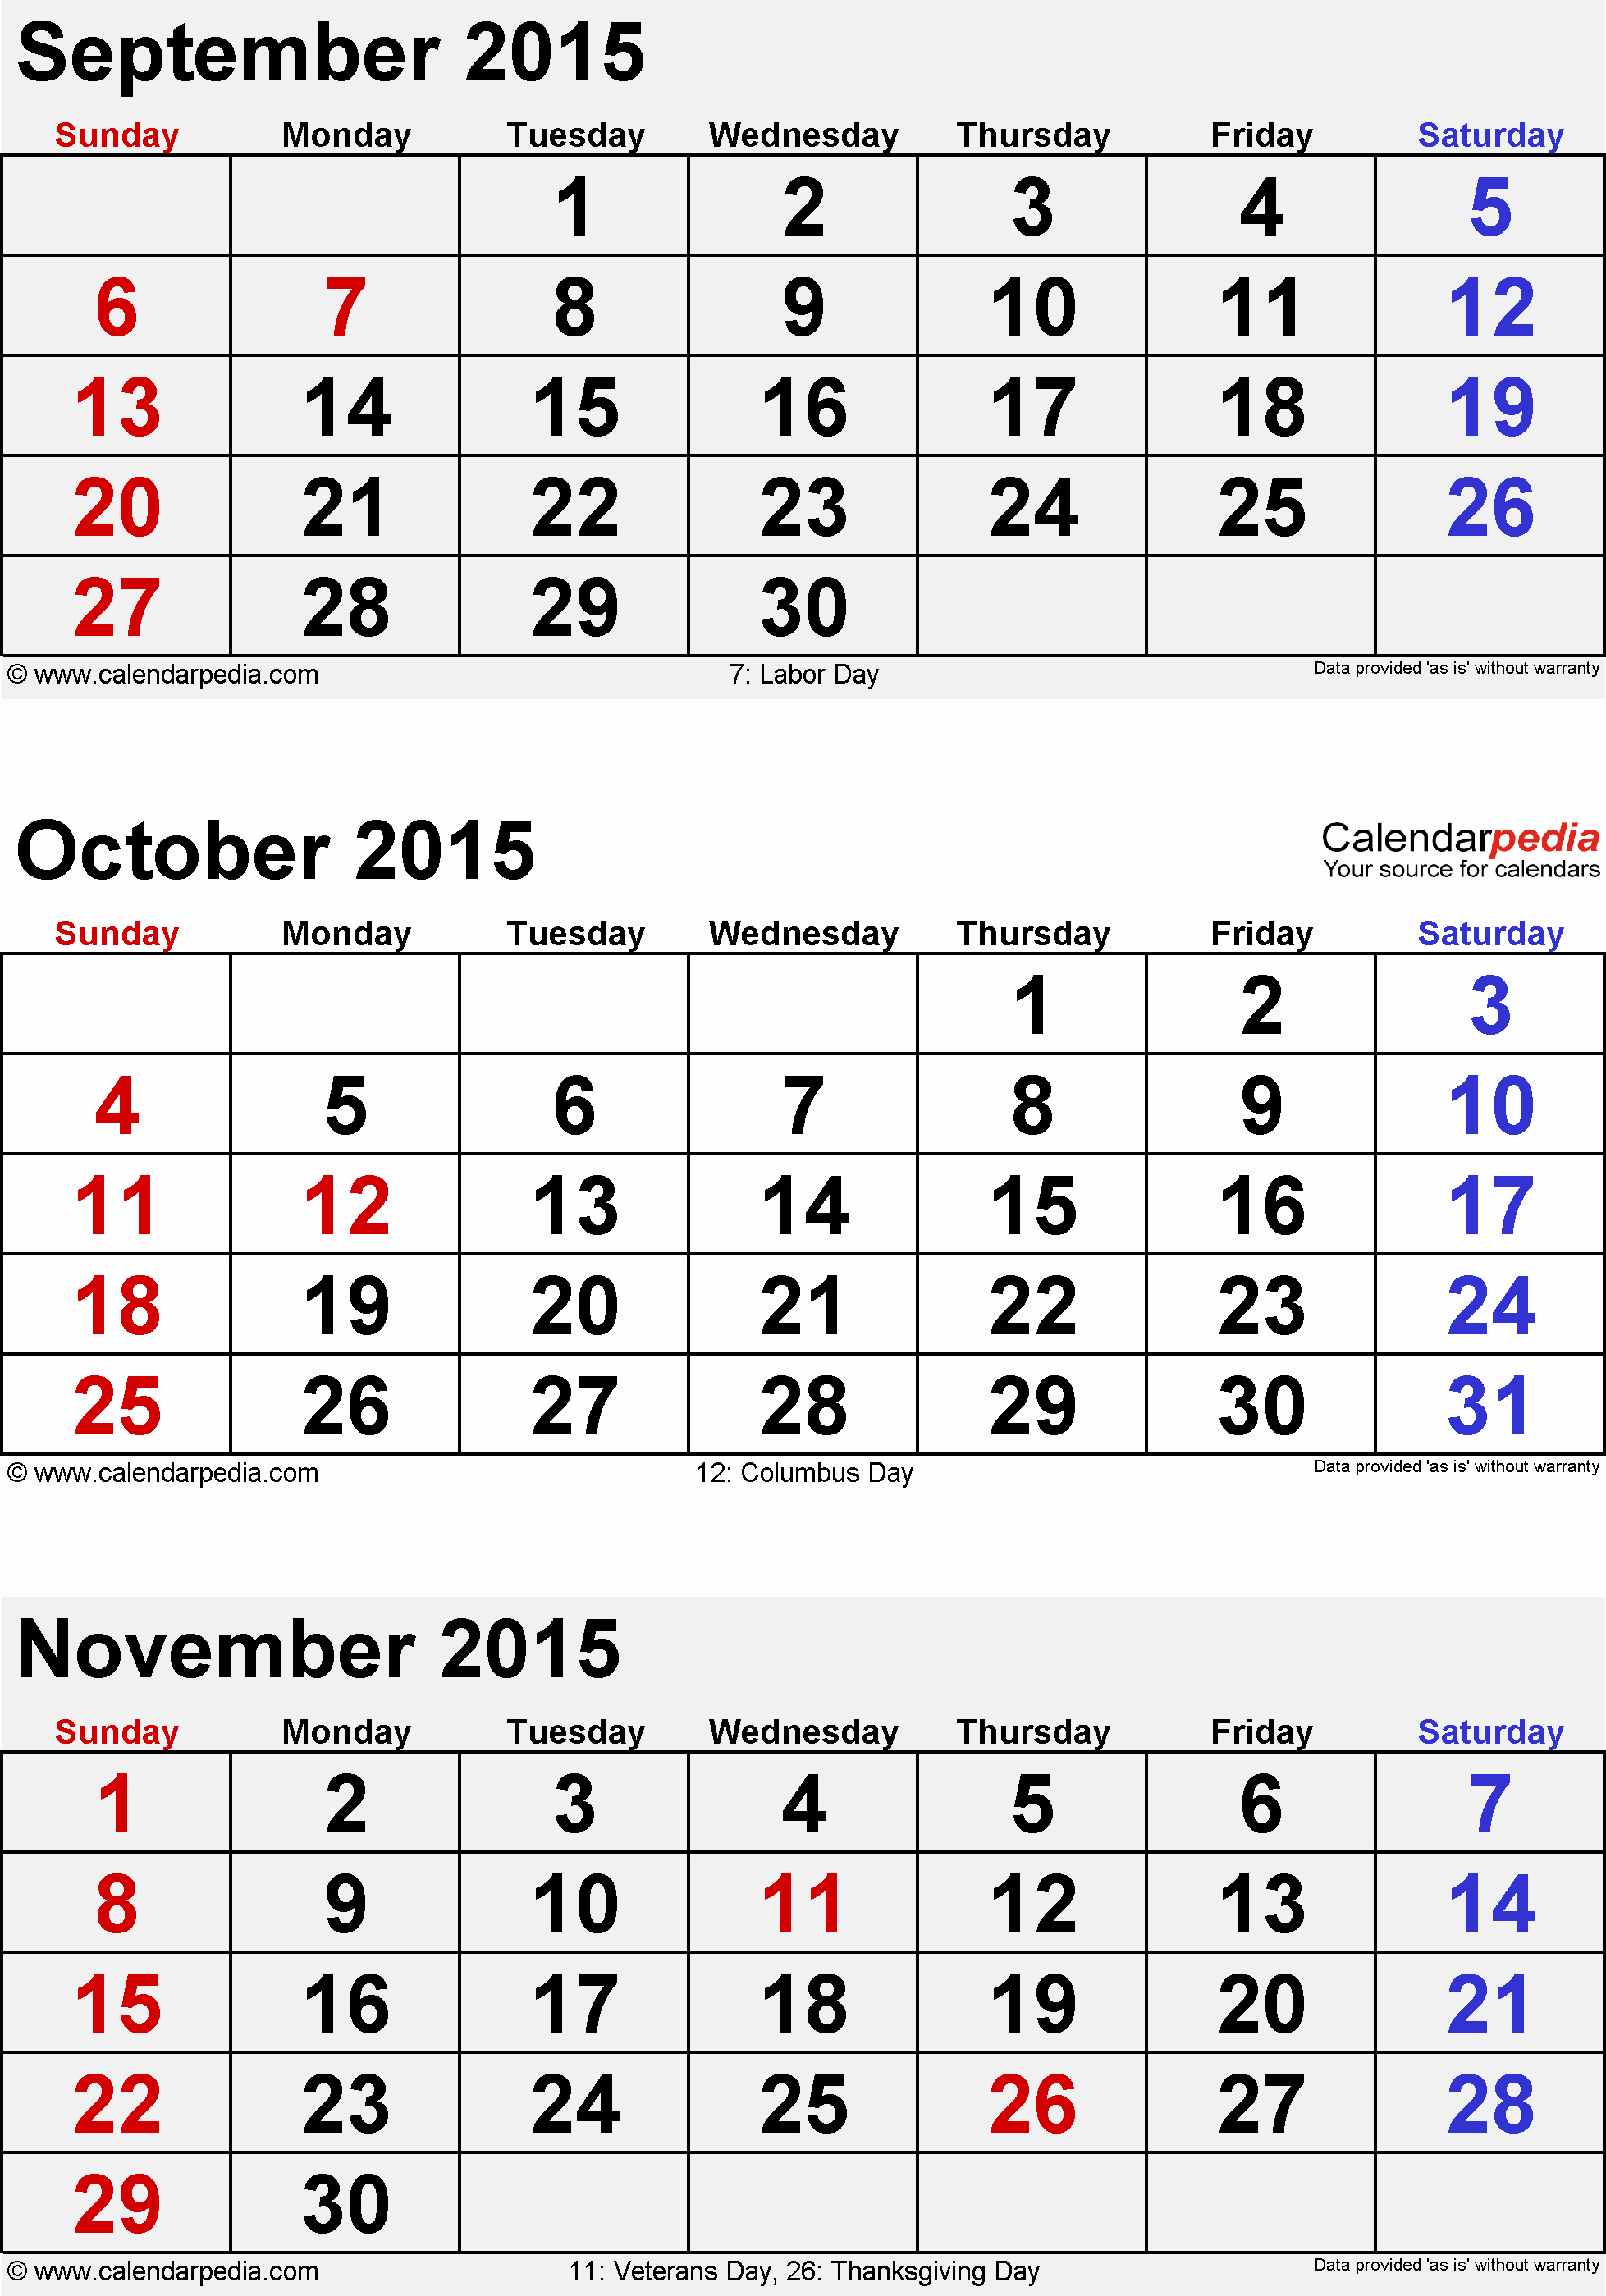 Printable 3 Month Calendar 2015 Fresh September October November 2015 3 Month Calendar